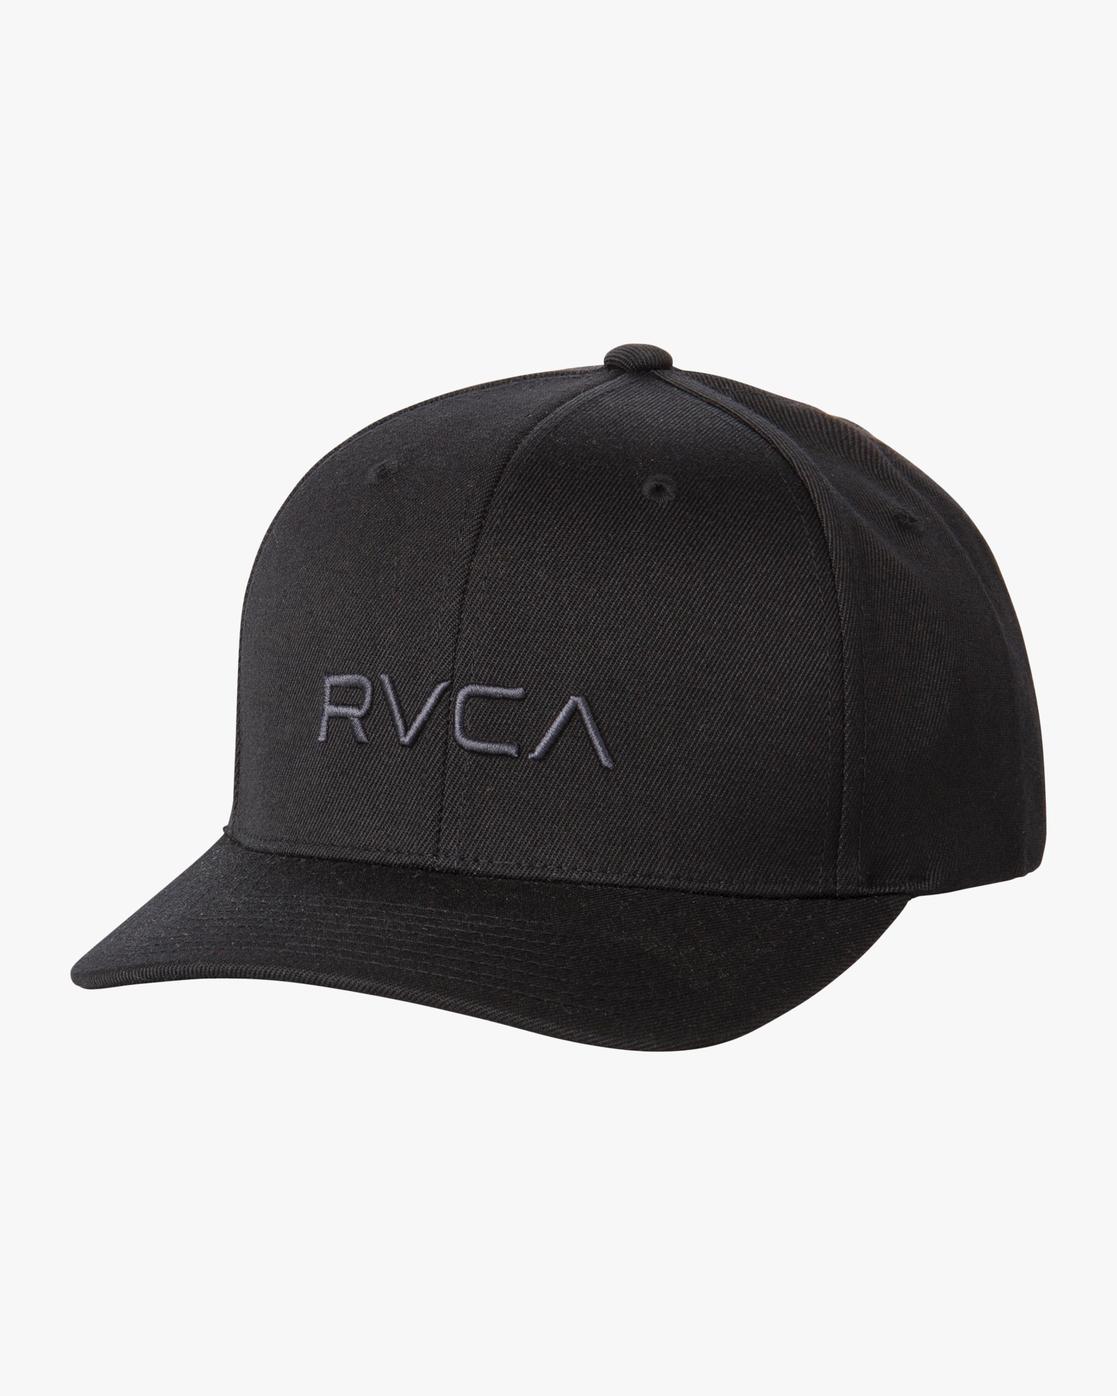 0 RVCA Flex Fit - Flexfit Hat for Men Black S5CPRSRVP0 RVCA